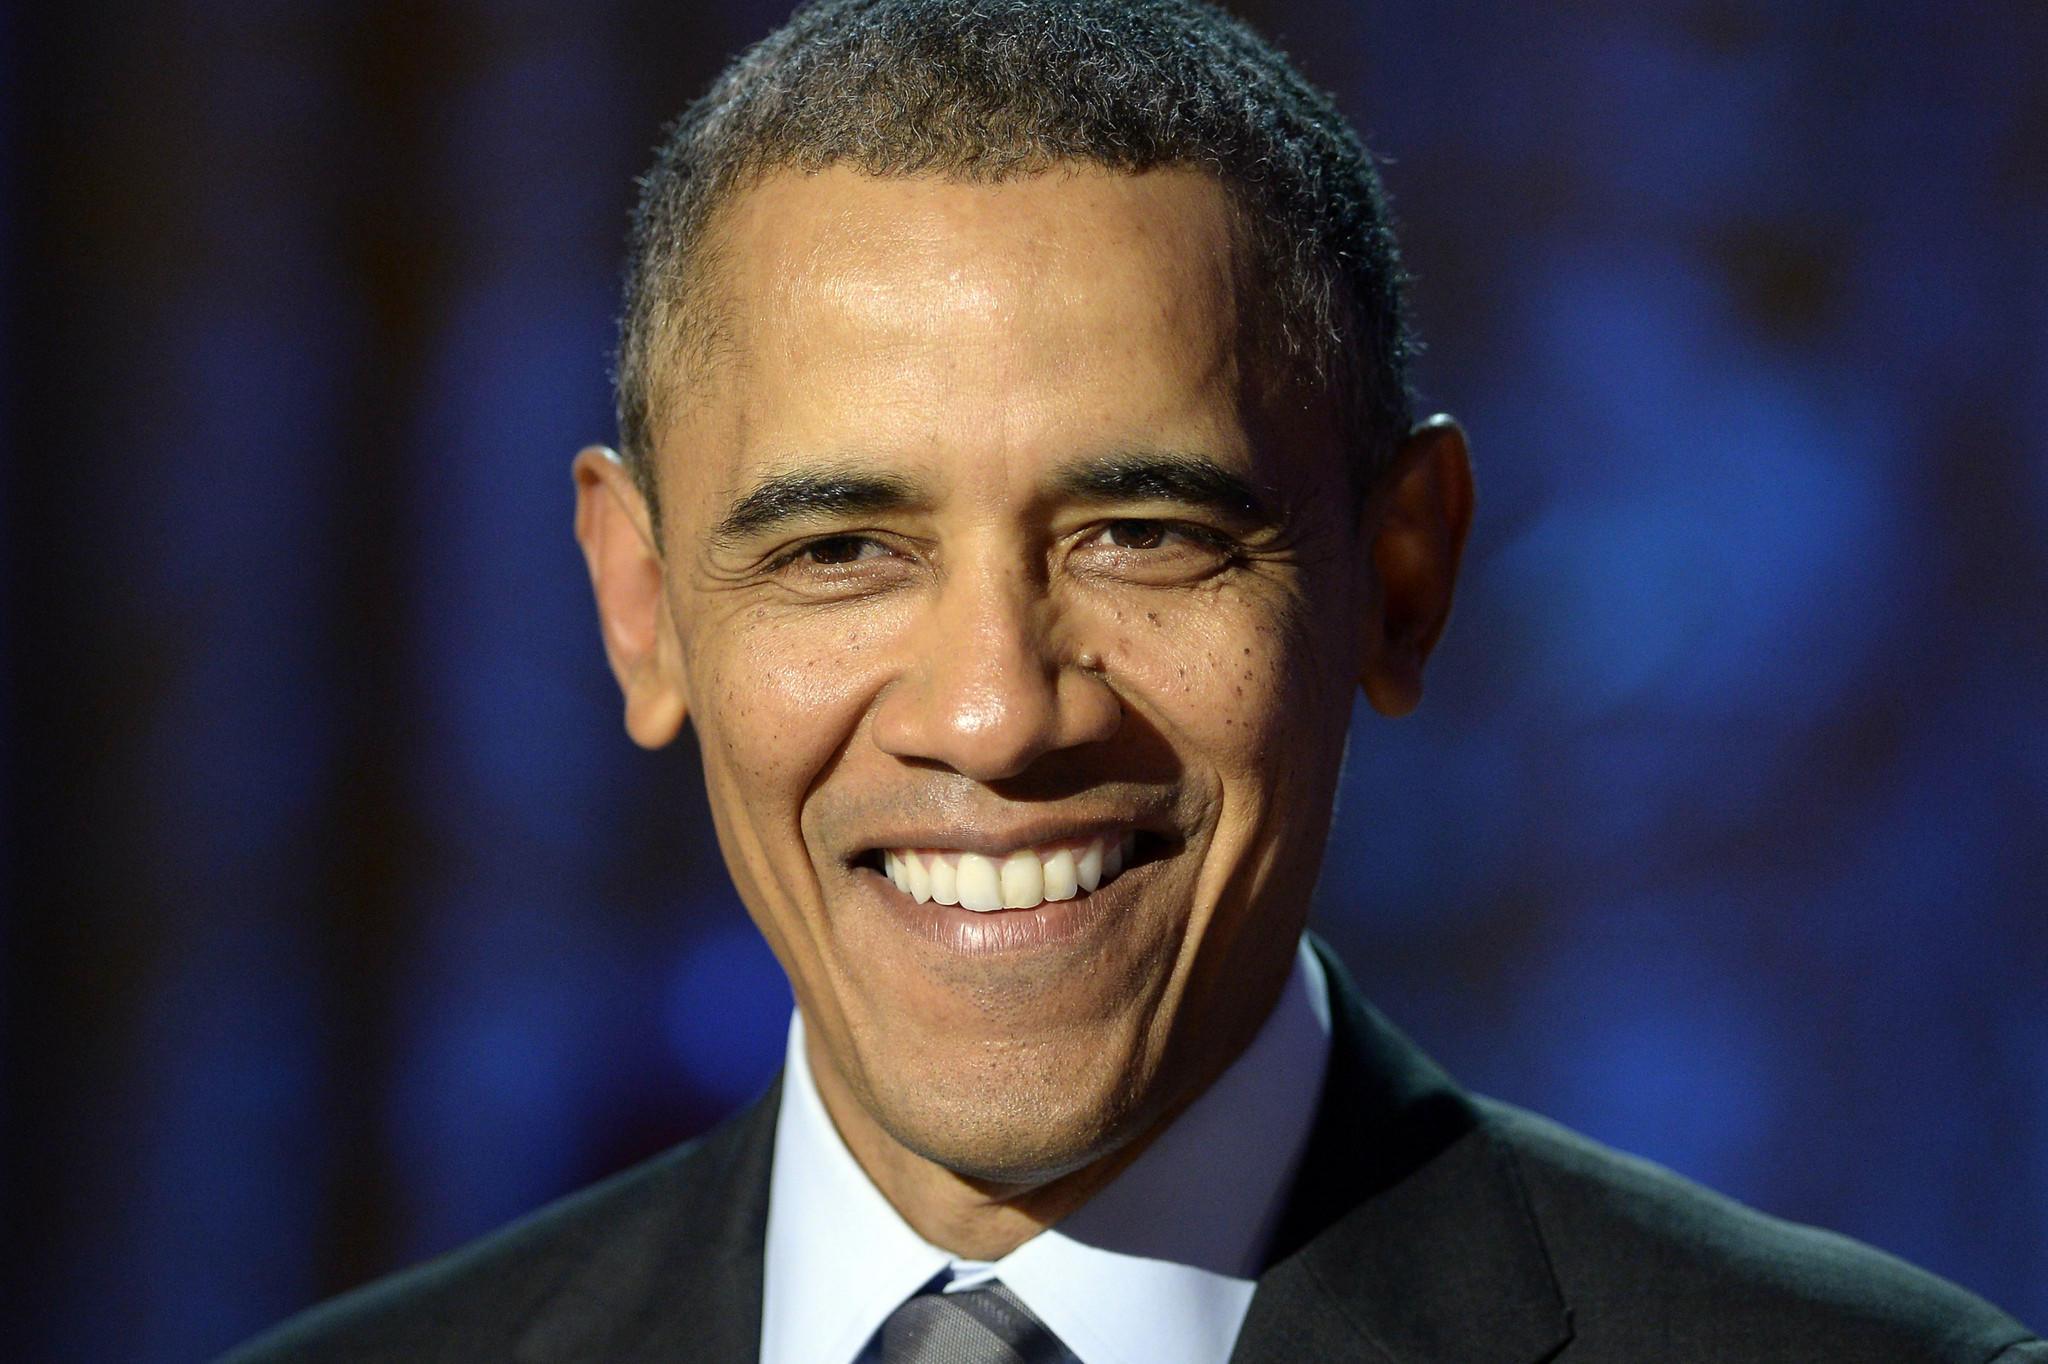 President Barack Obama at a White House event.